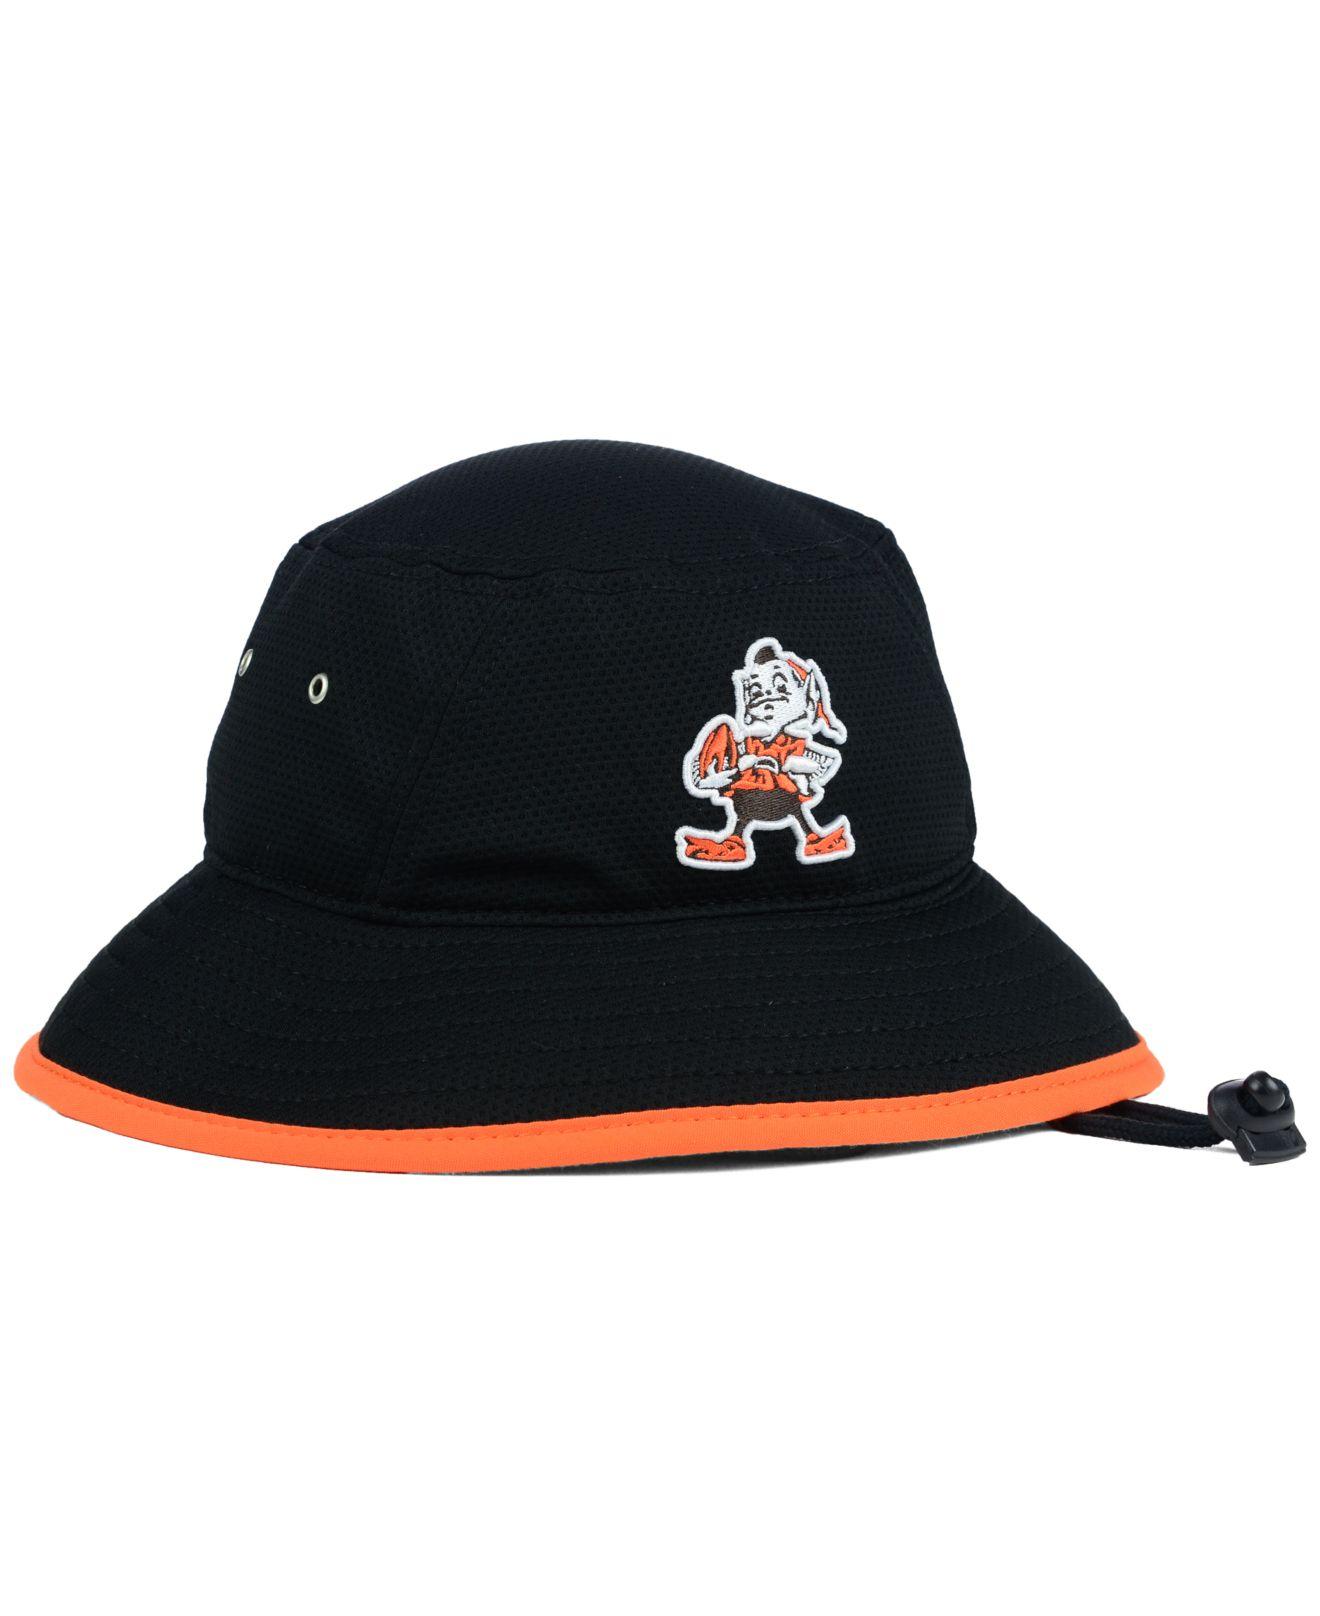 Lyst - KTZ Cleveland Browns Training Bucket Hat in Black for Men d35c0f6e2